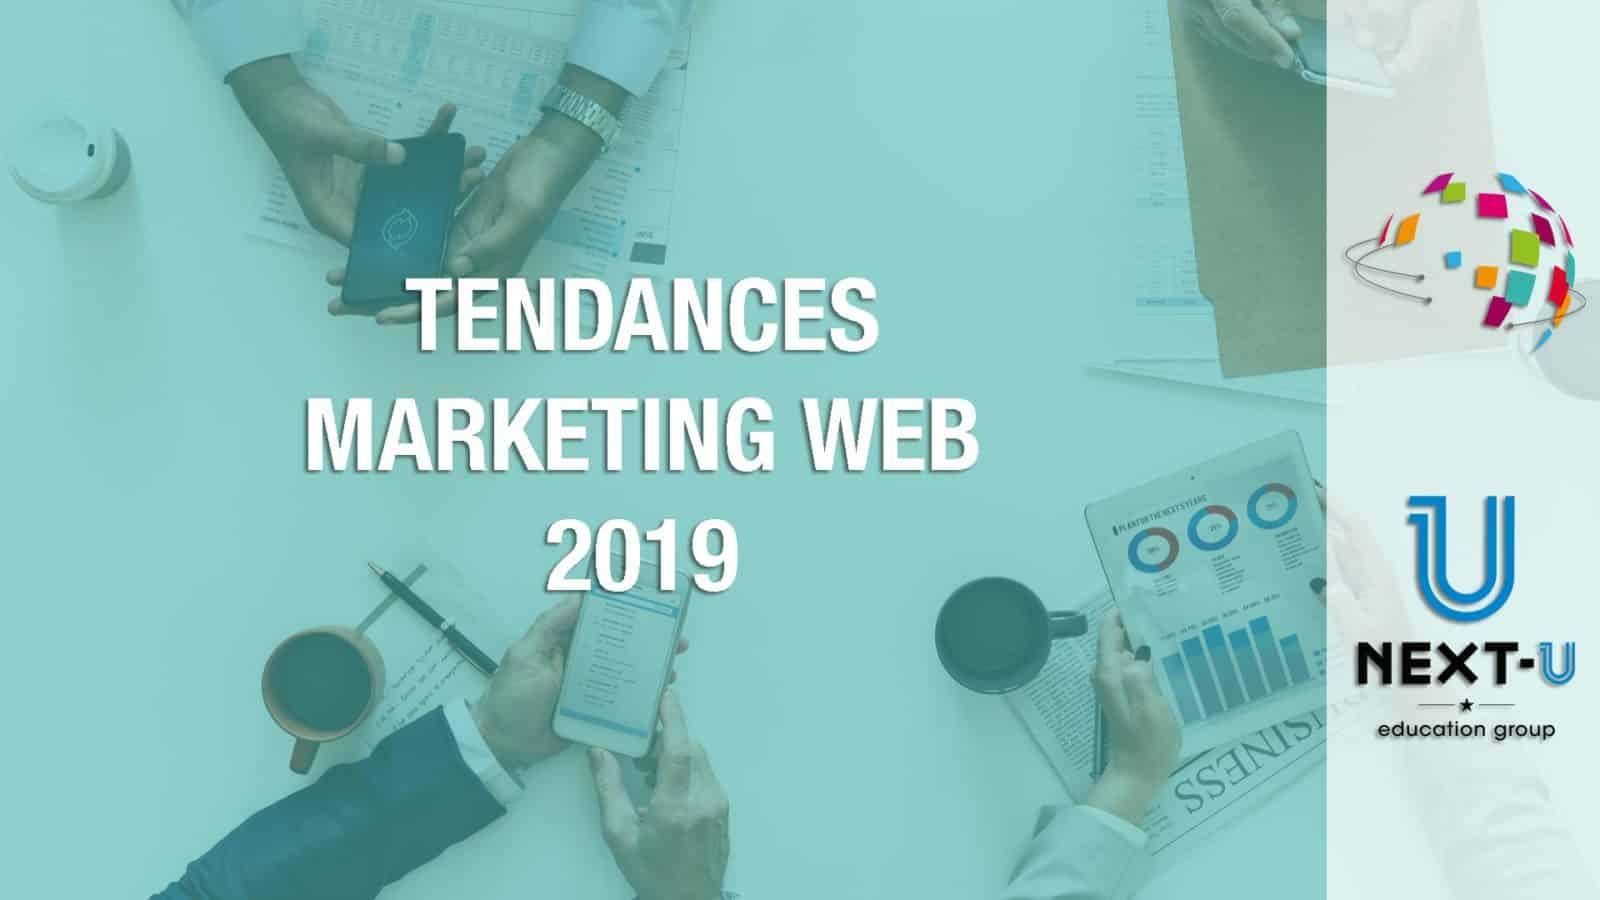 illustration marketing web tendance 2019